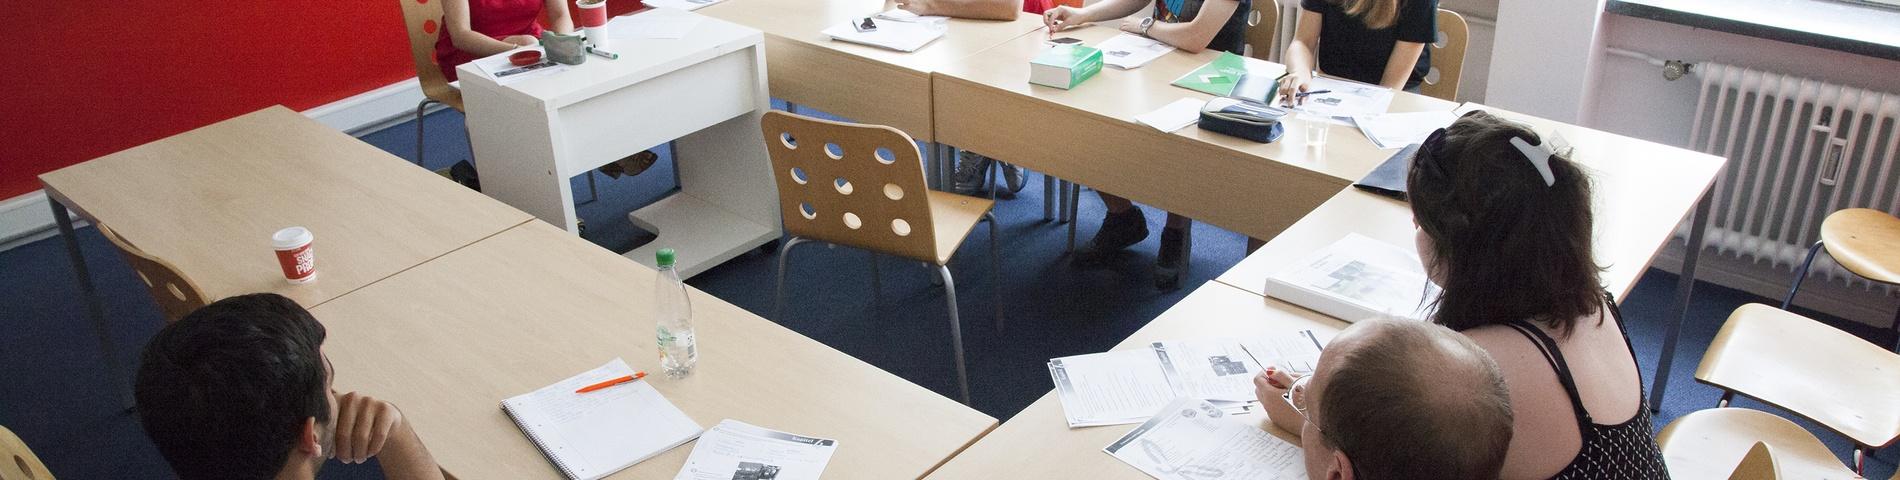 Berlin Sprachschule صورة 1